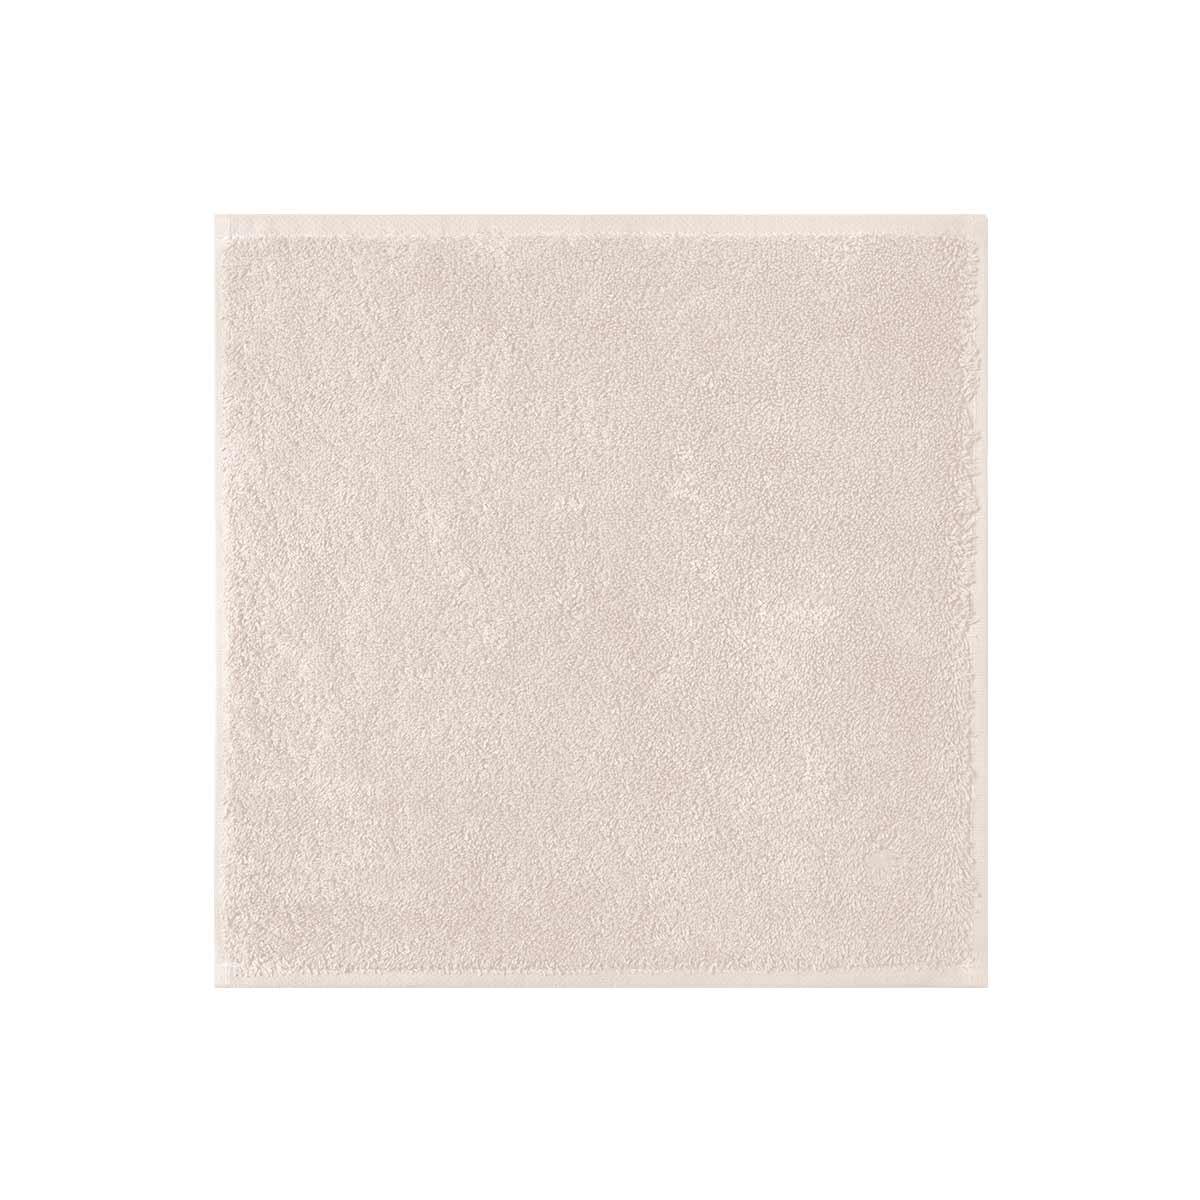 Etoile Nacre Wash Towel 33x33cm